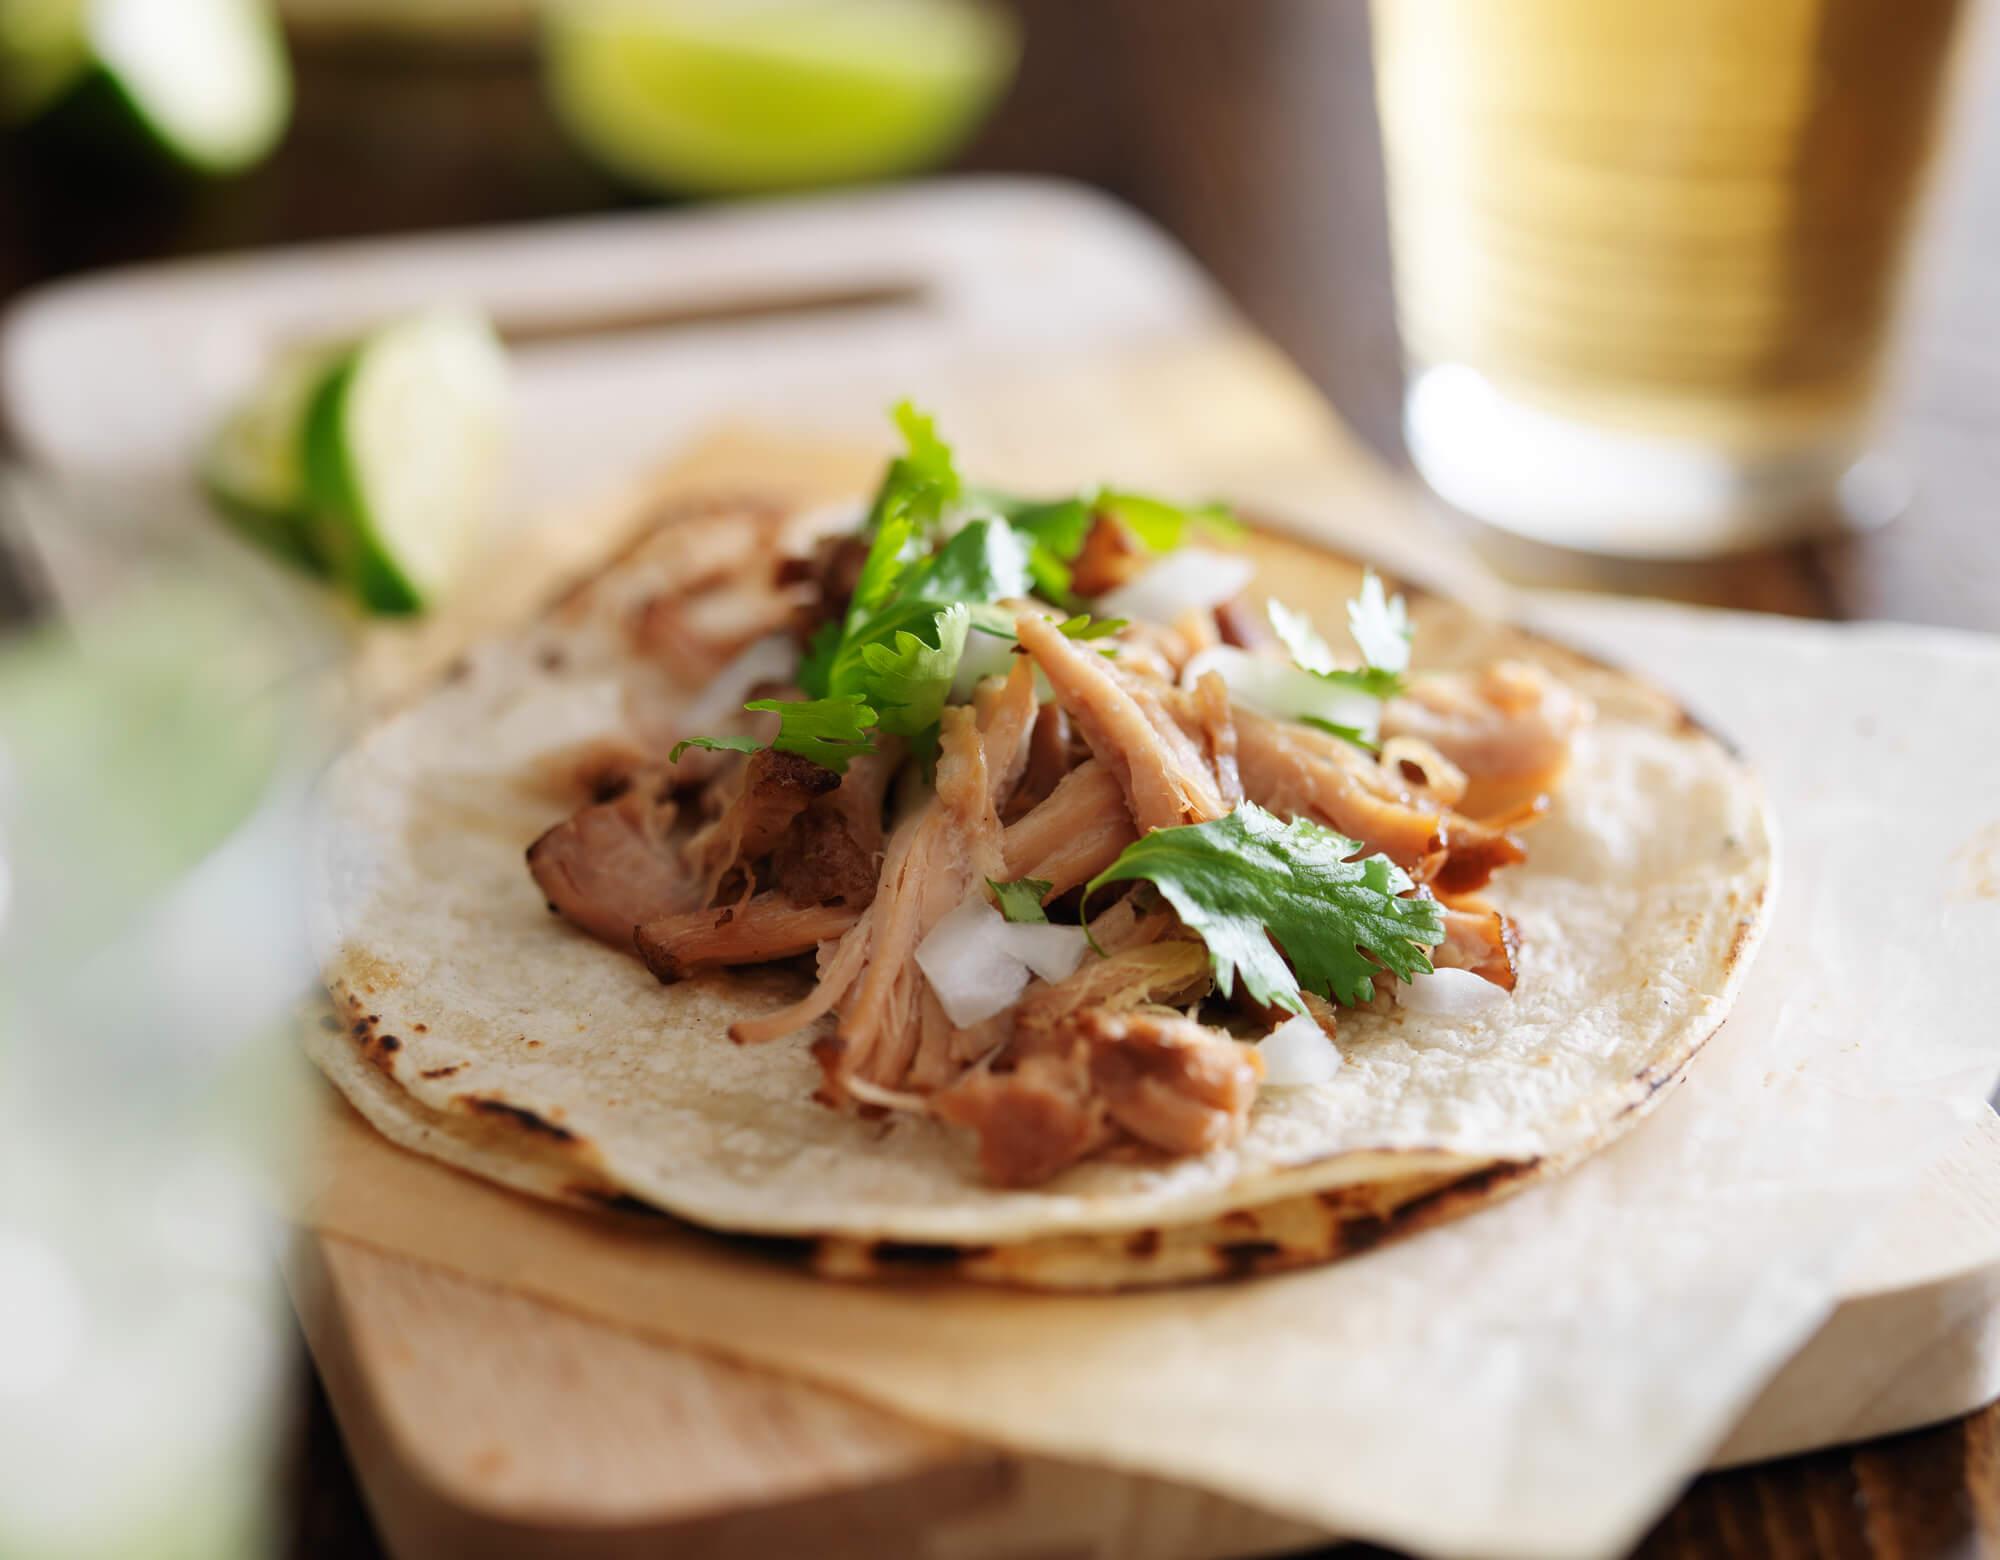 Slow Cooker Pork Carnitas (Trim Healthy Mama Authentic Pork Carnitas)